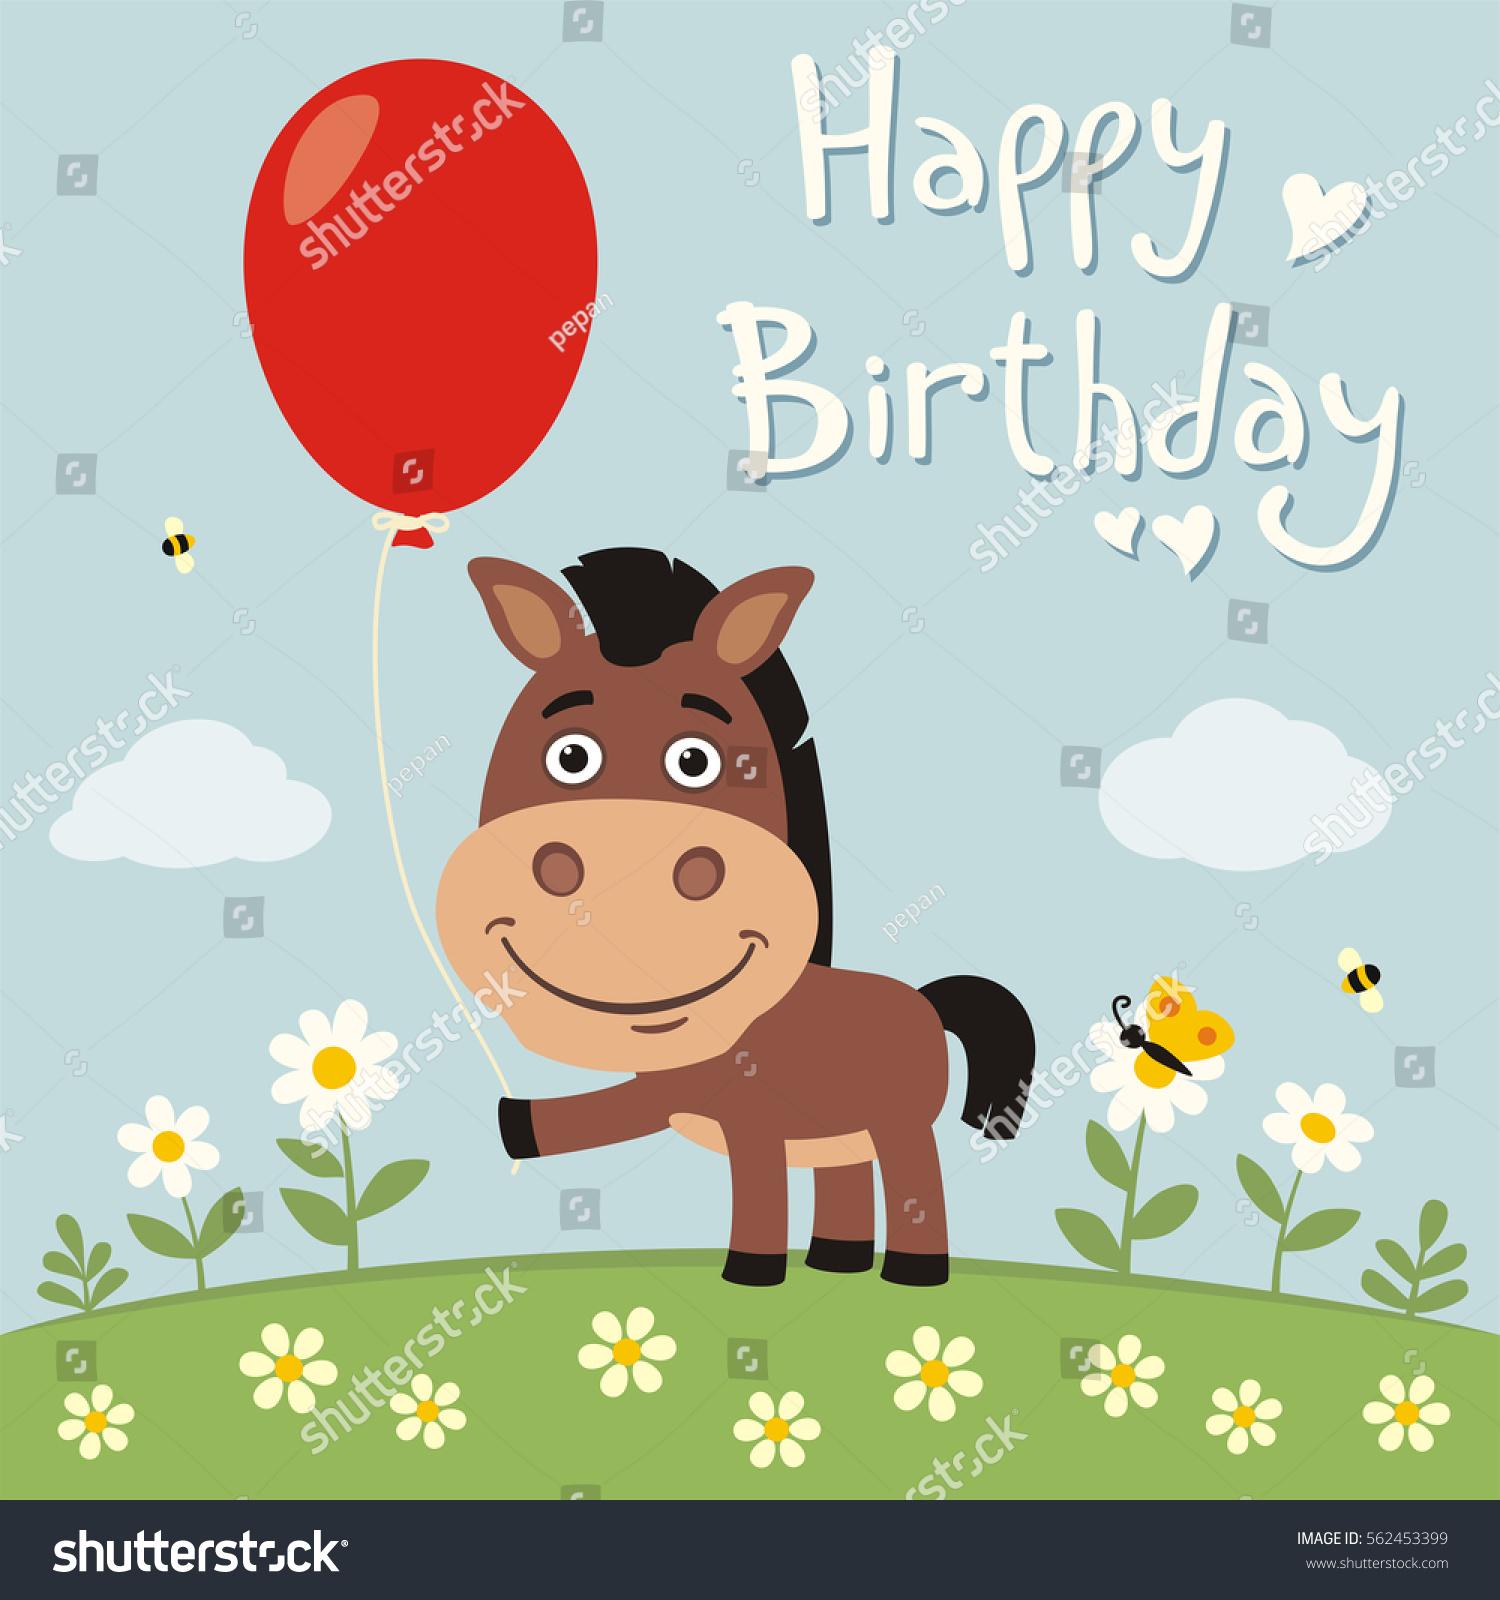 Happy Birthday Funny Horse Red Balloon Stock Vector Royalty Free 562453399